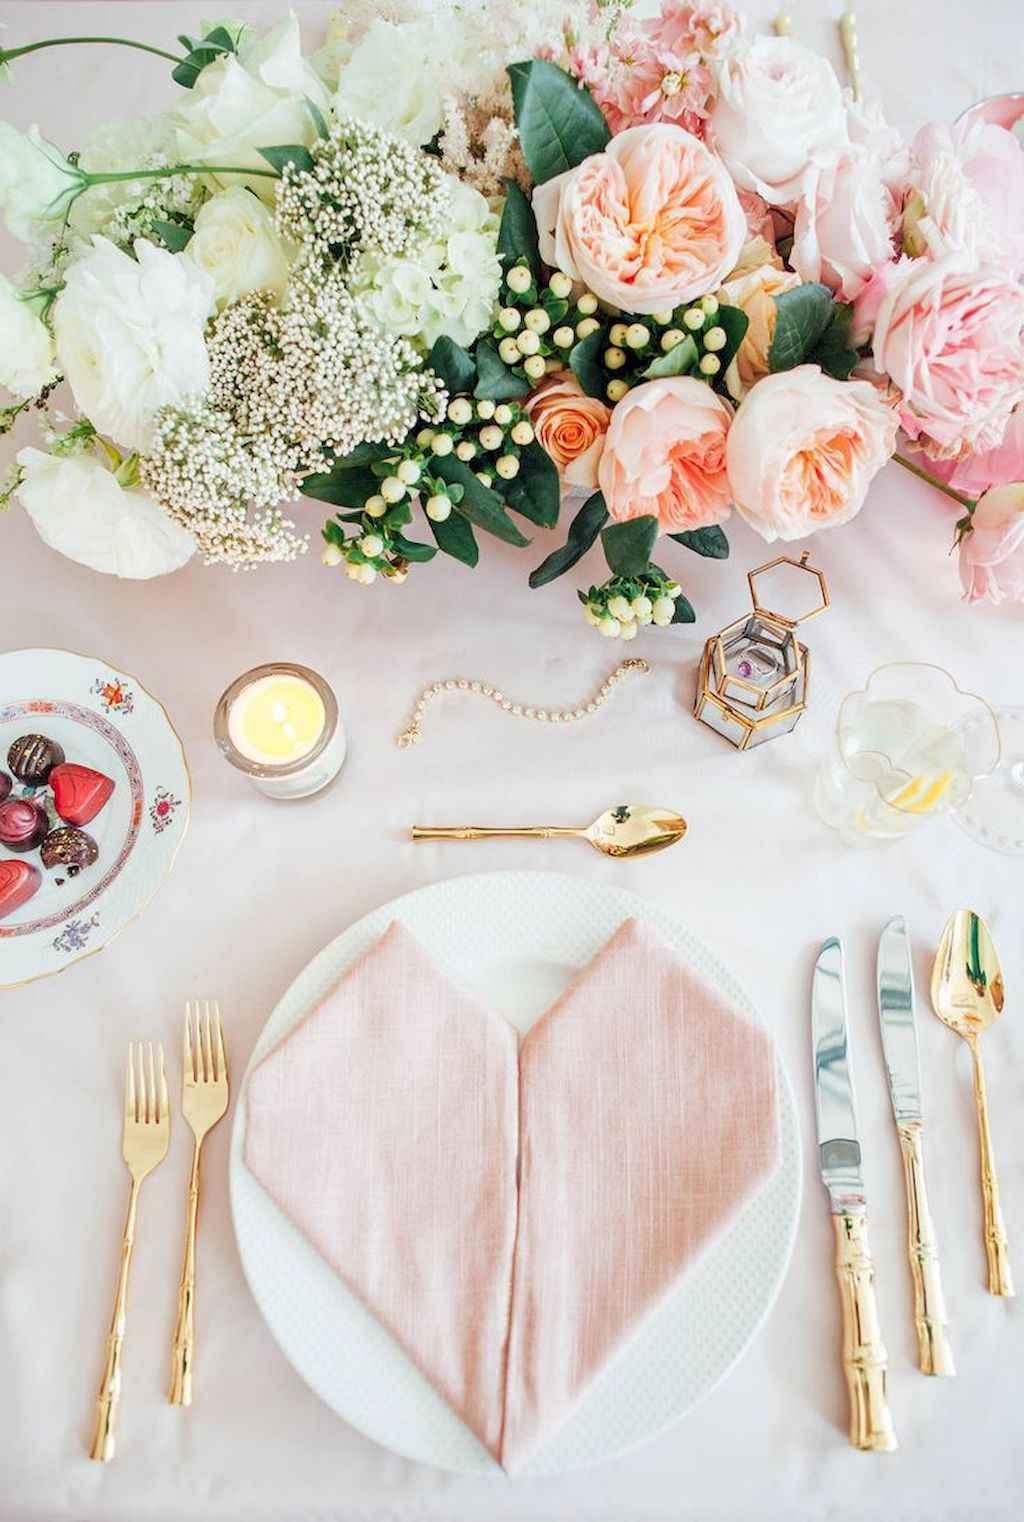 66 Romantic Valentines Table Settings Decor Ideas (13)